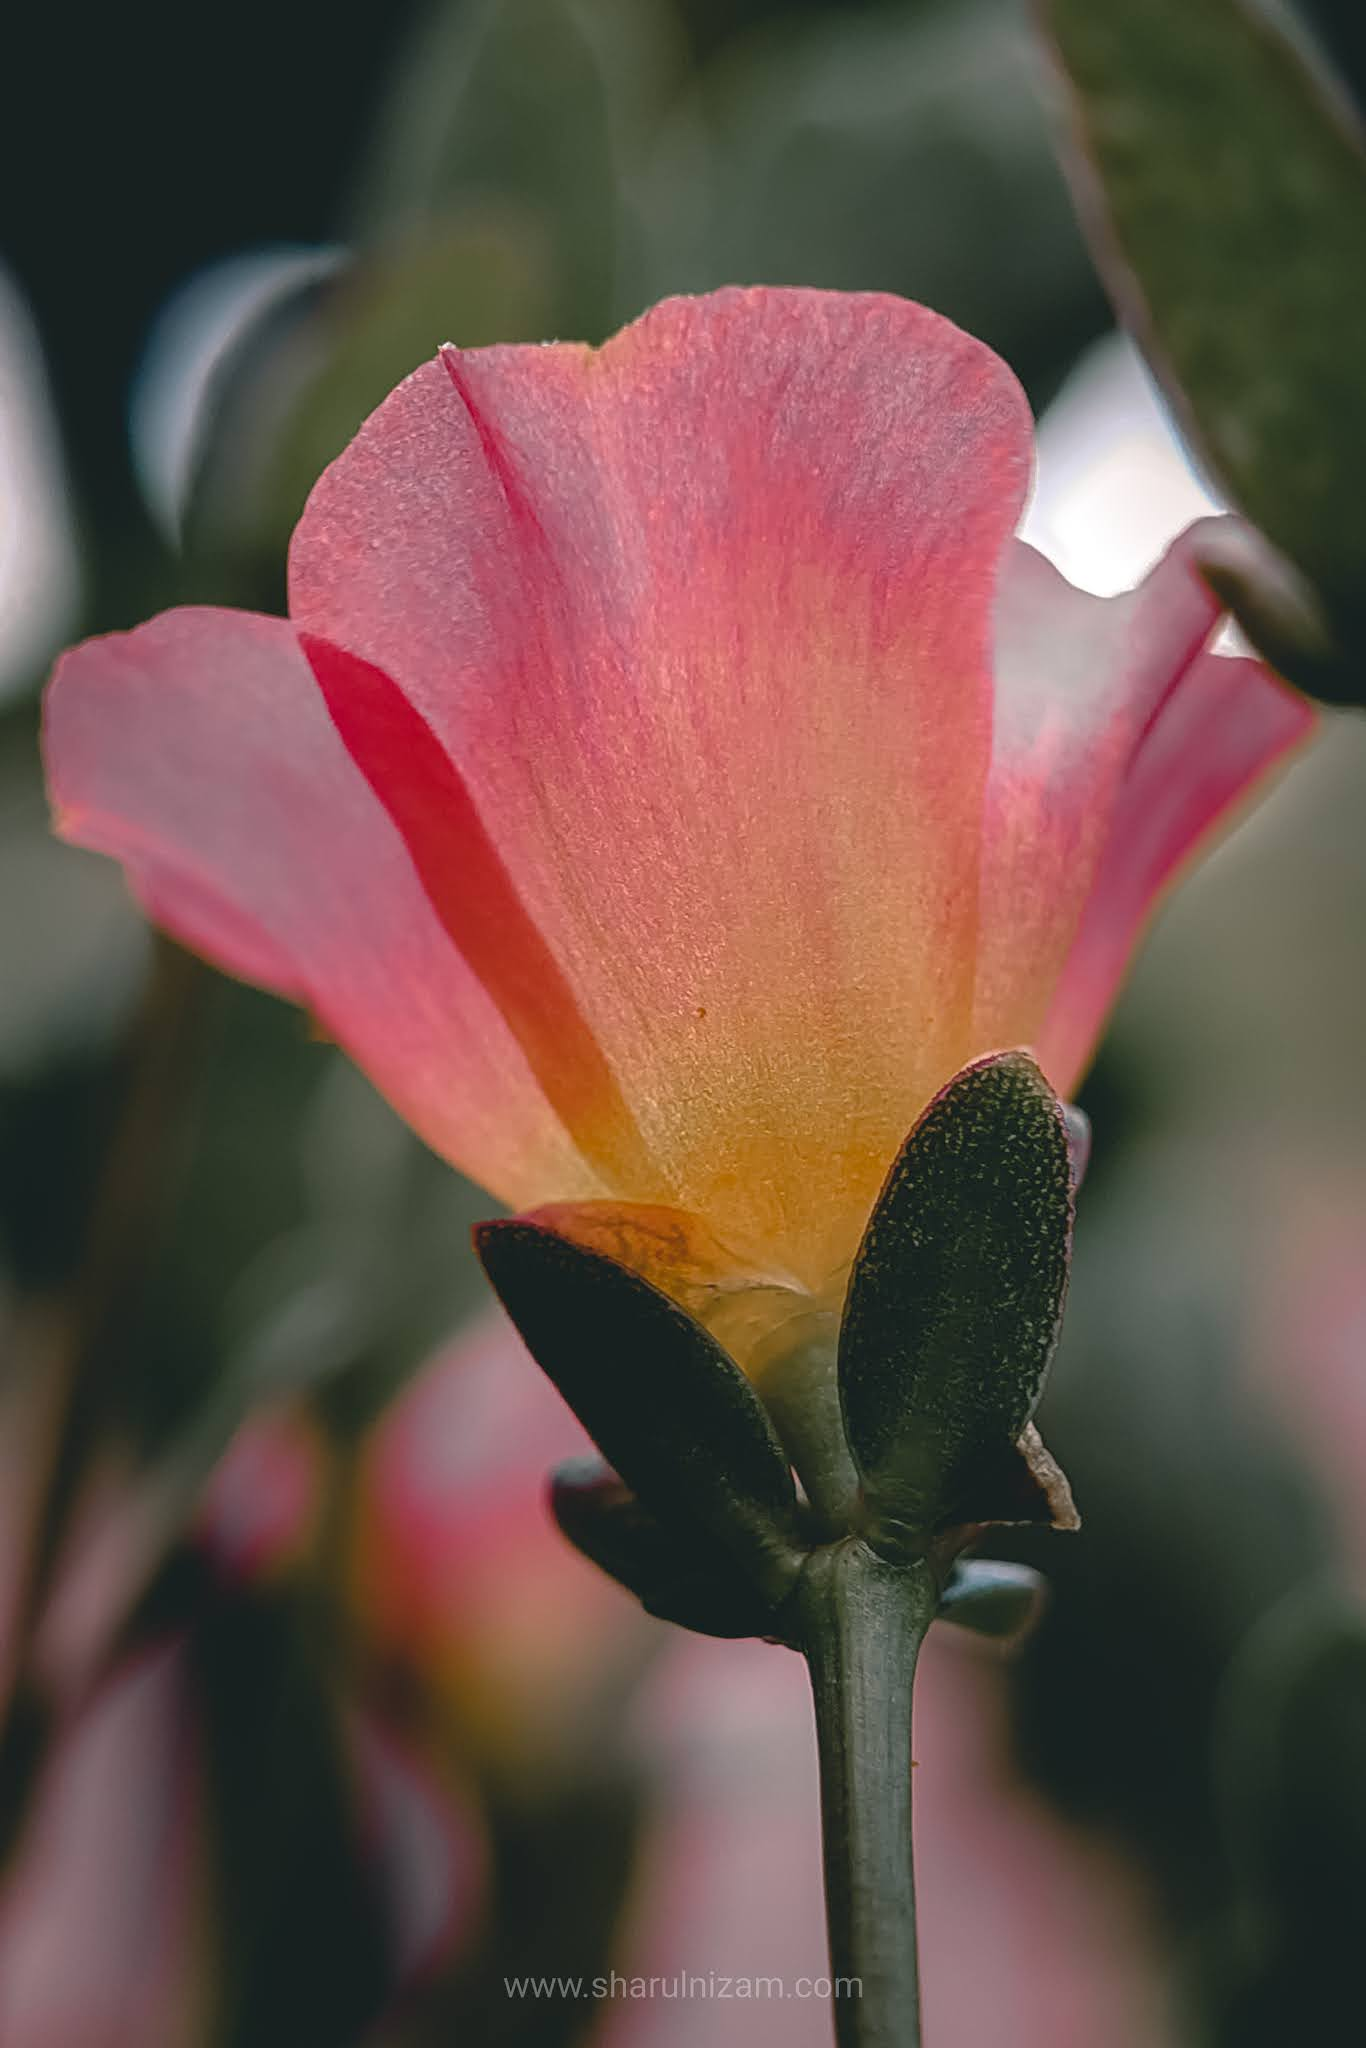 10 Keping Gambar Mobile Macro Photography Using Samsung A52 And Lensbong Nikon 35 mm)